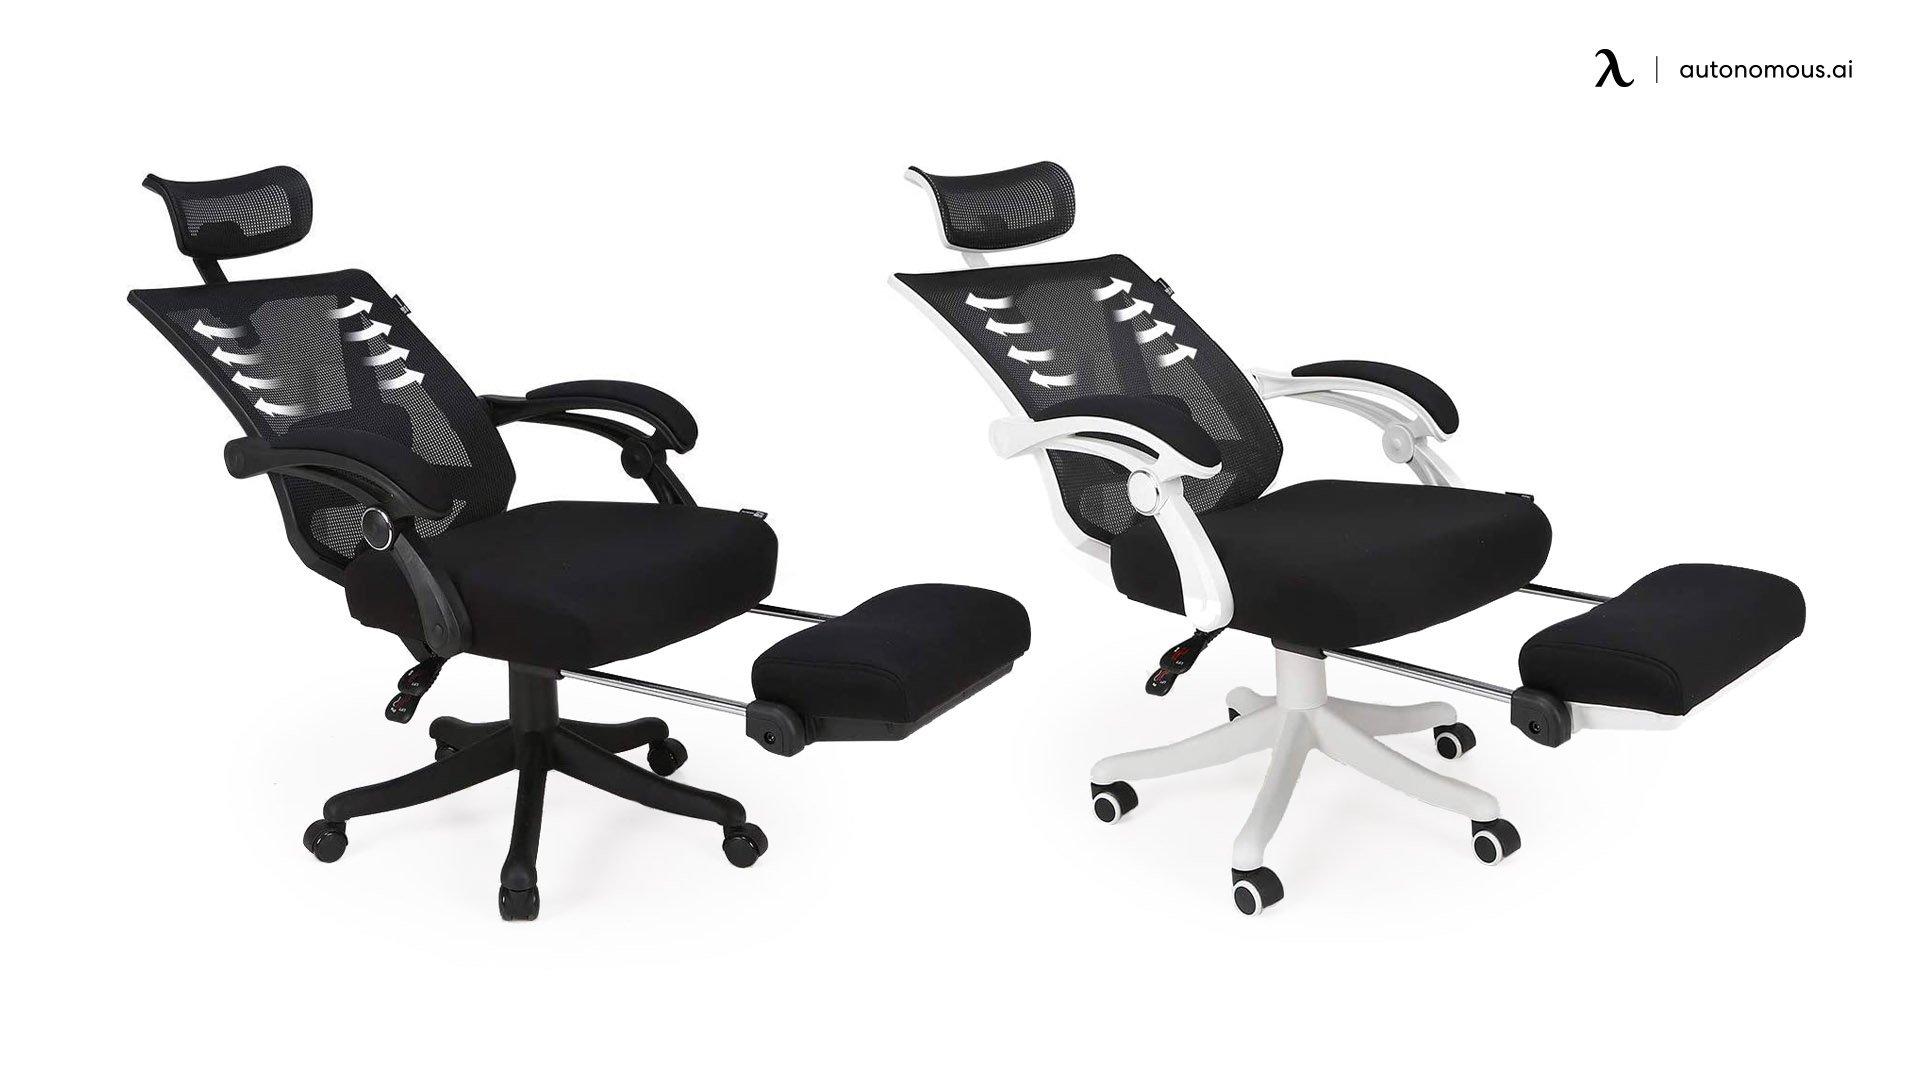 Hbada Reclining Ergonomic Office Chair